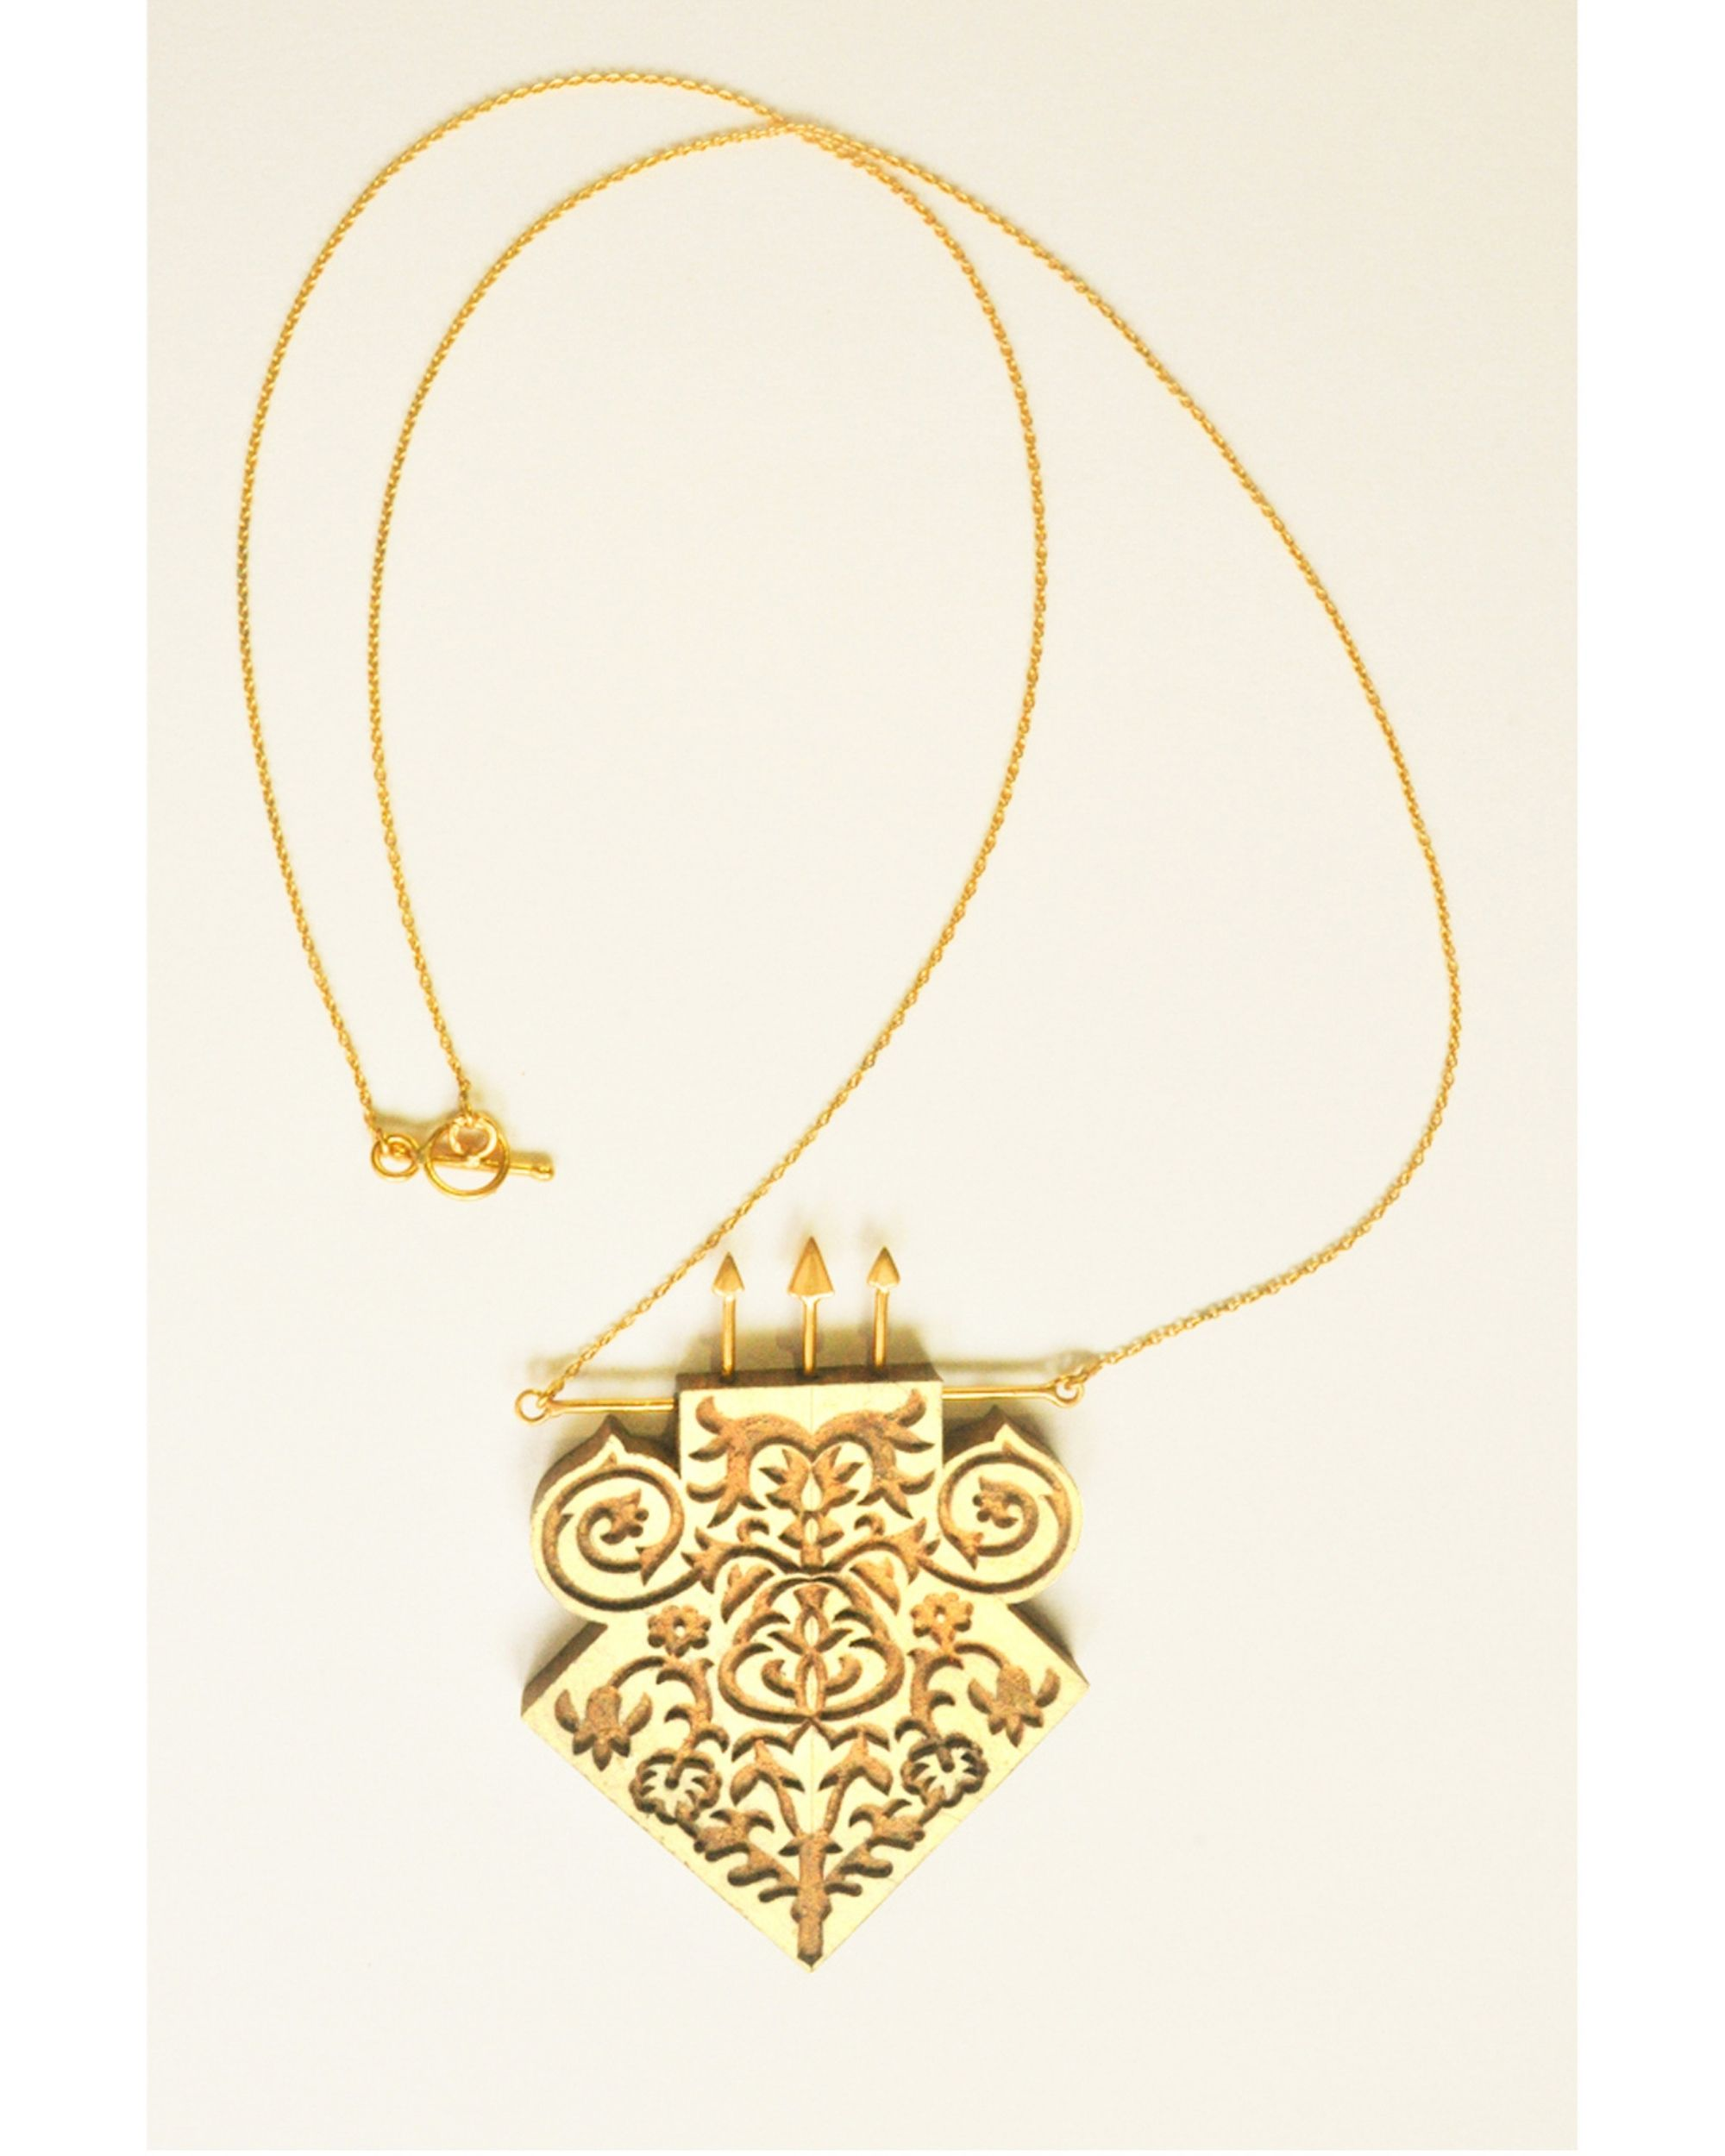 Hand crafted teak wood neckpiece